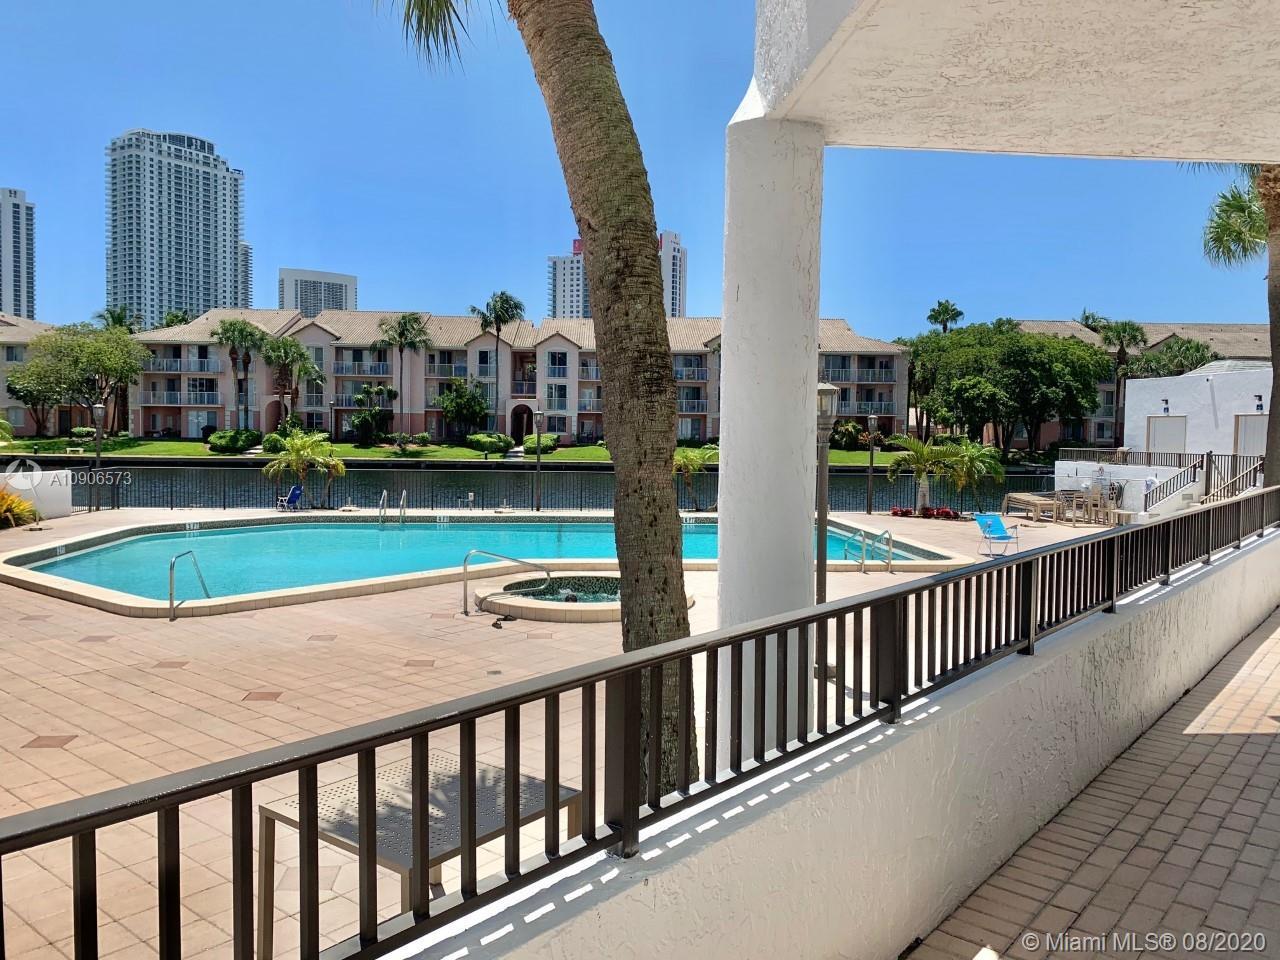 Photo of 300 Three Islands Blvd #C7, Hallandale Beach, Florida, 33009 - Your view!